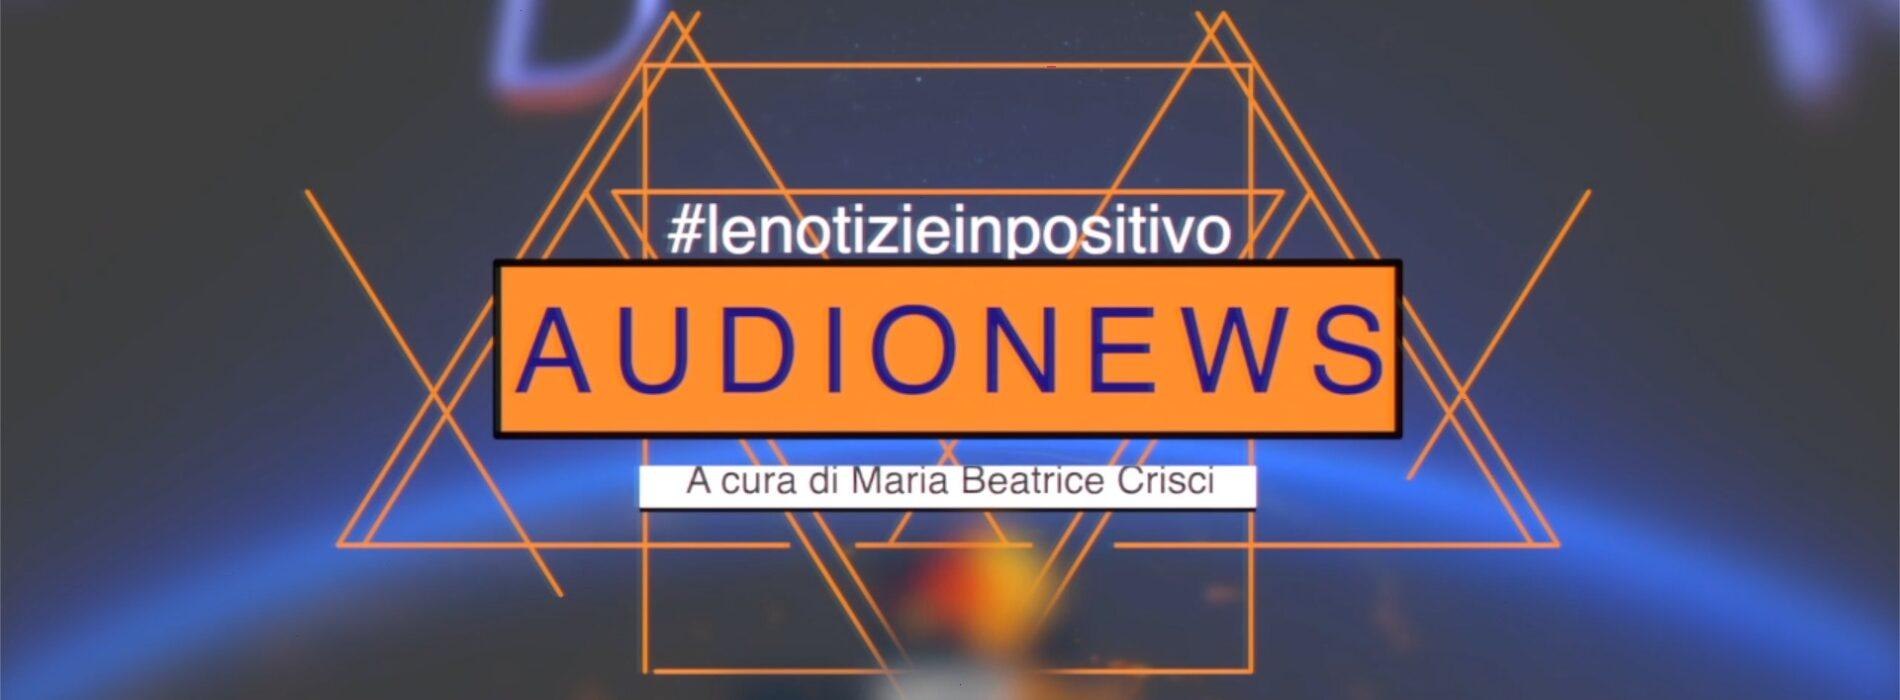 Audionews di Ondawebtv. 12 settembre